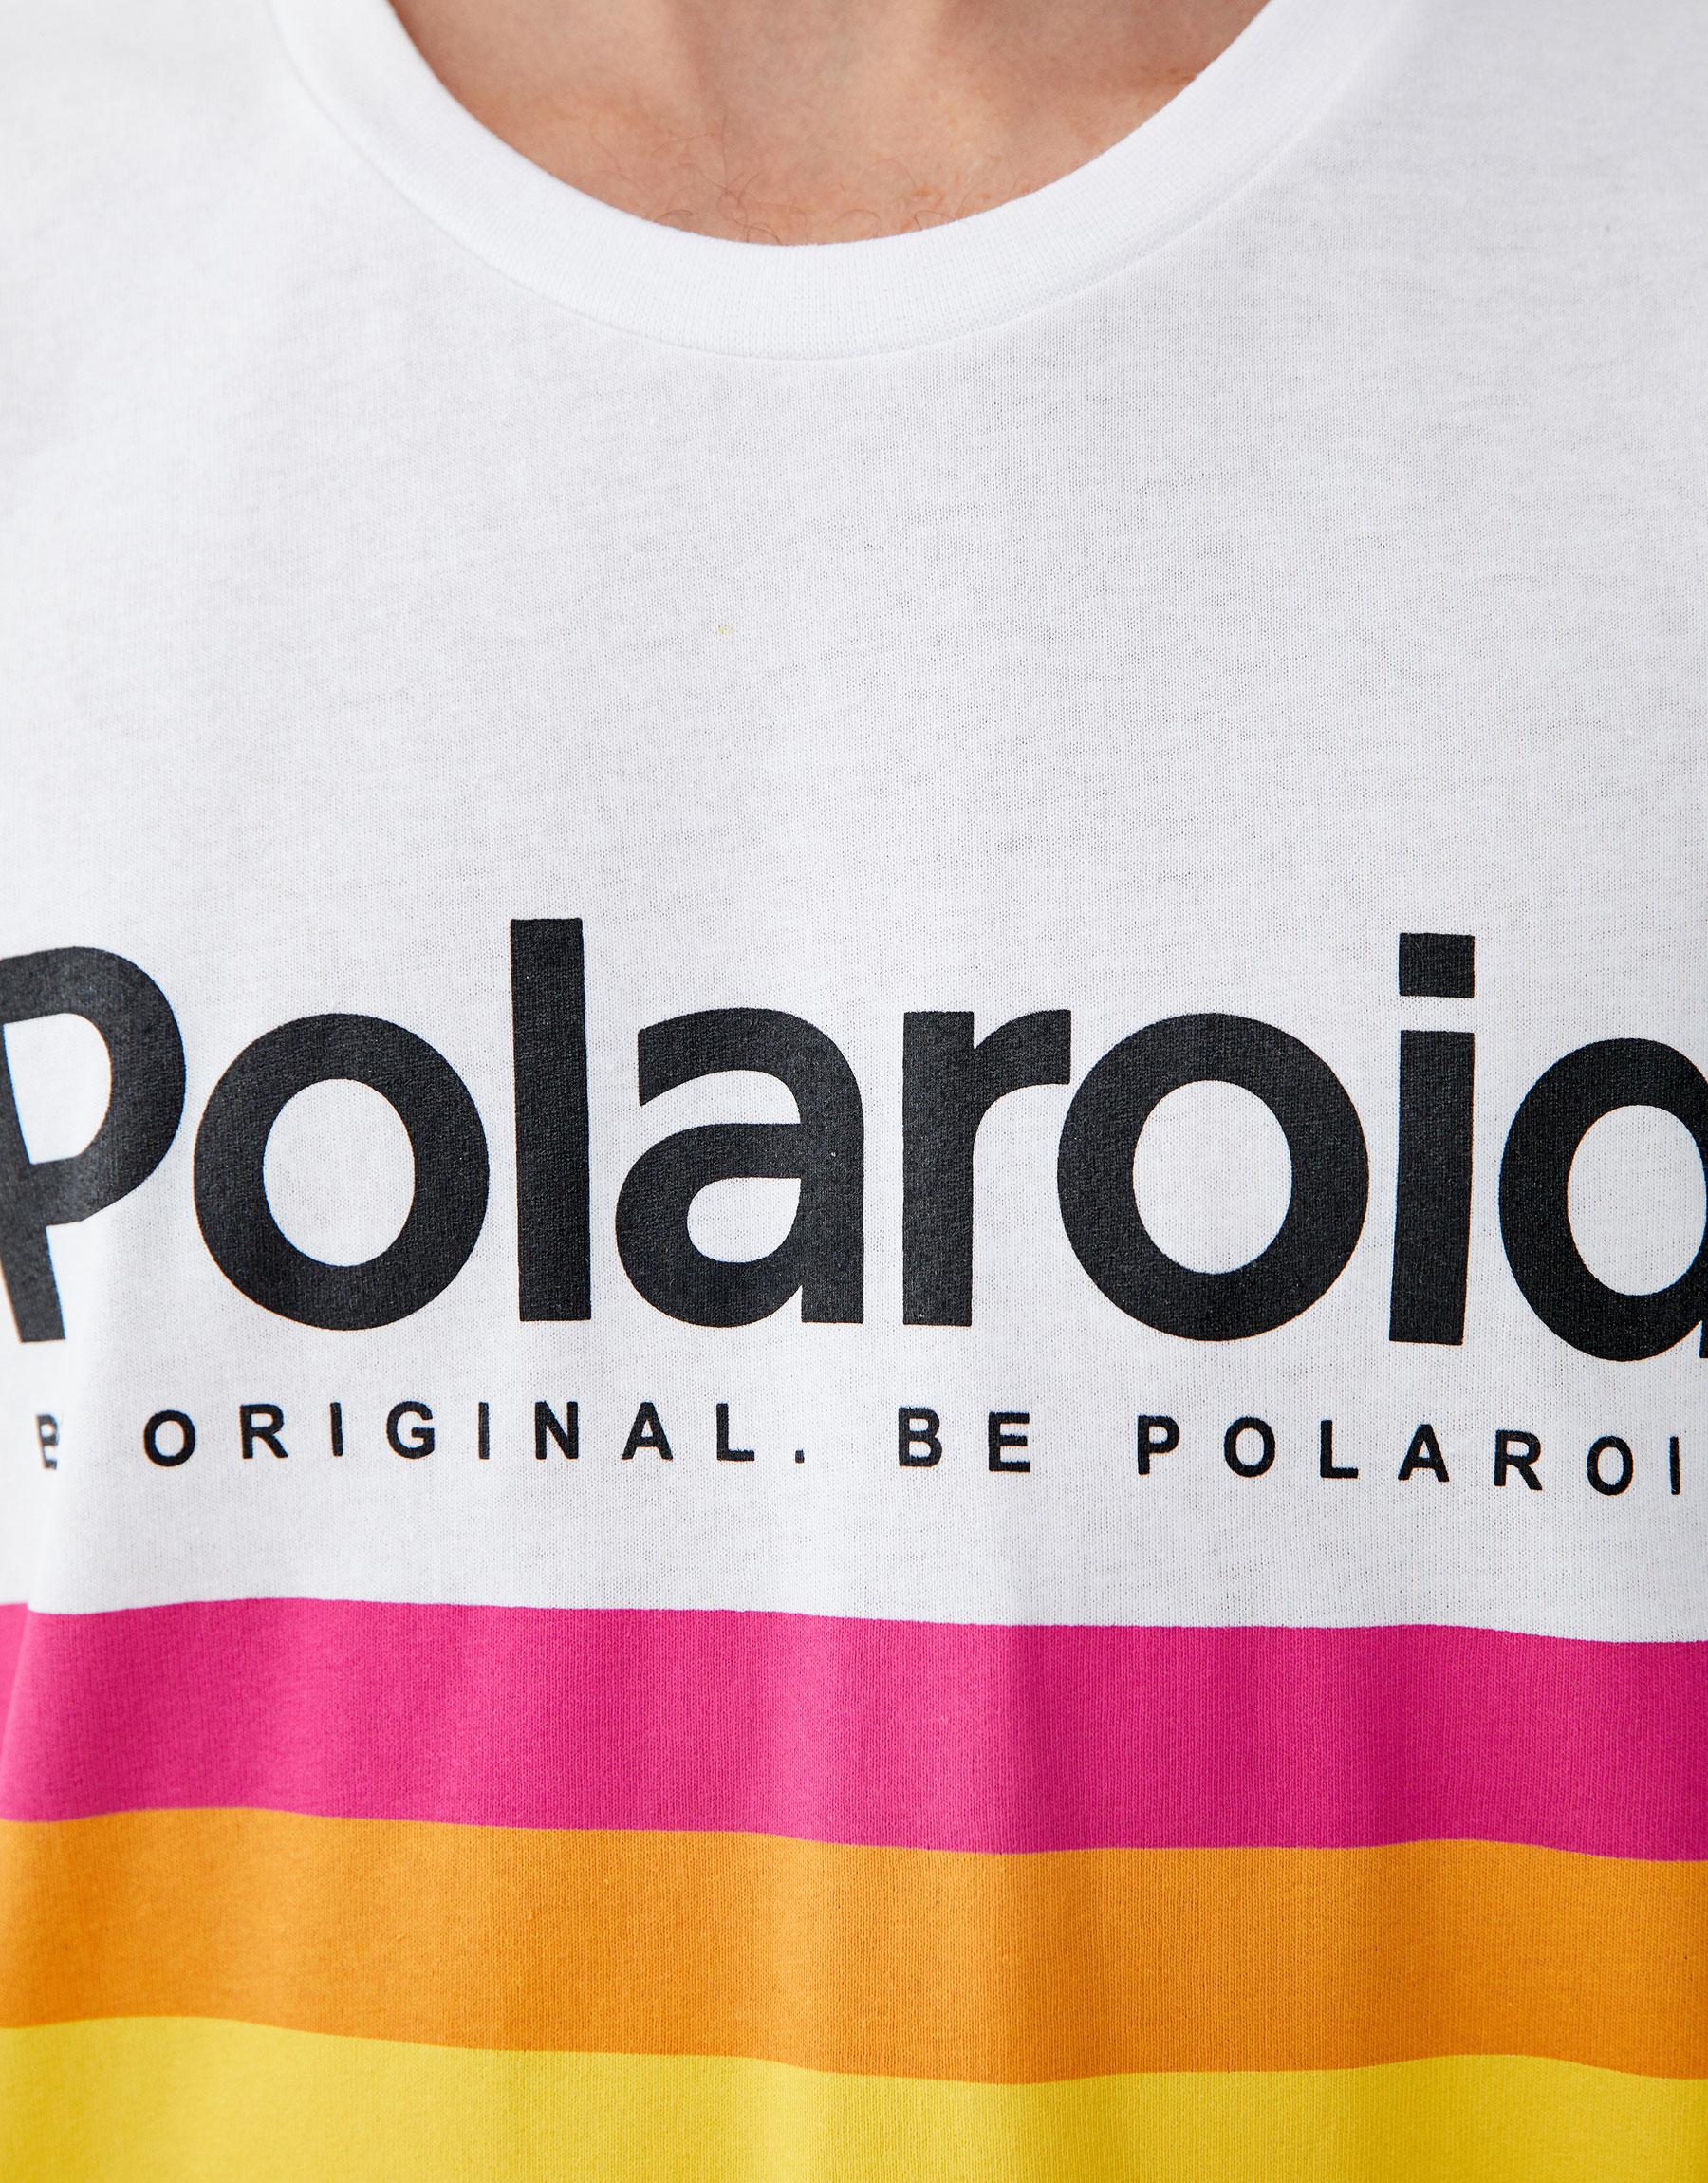 a38025704 Pull & Bear 'Polaroid' logo T-shirt at £14.99 | love the brands